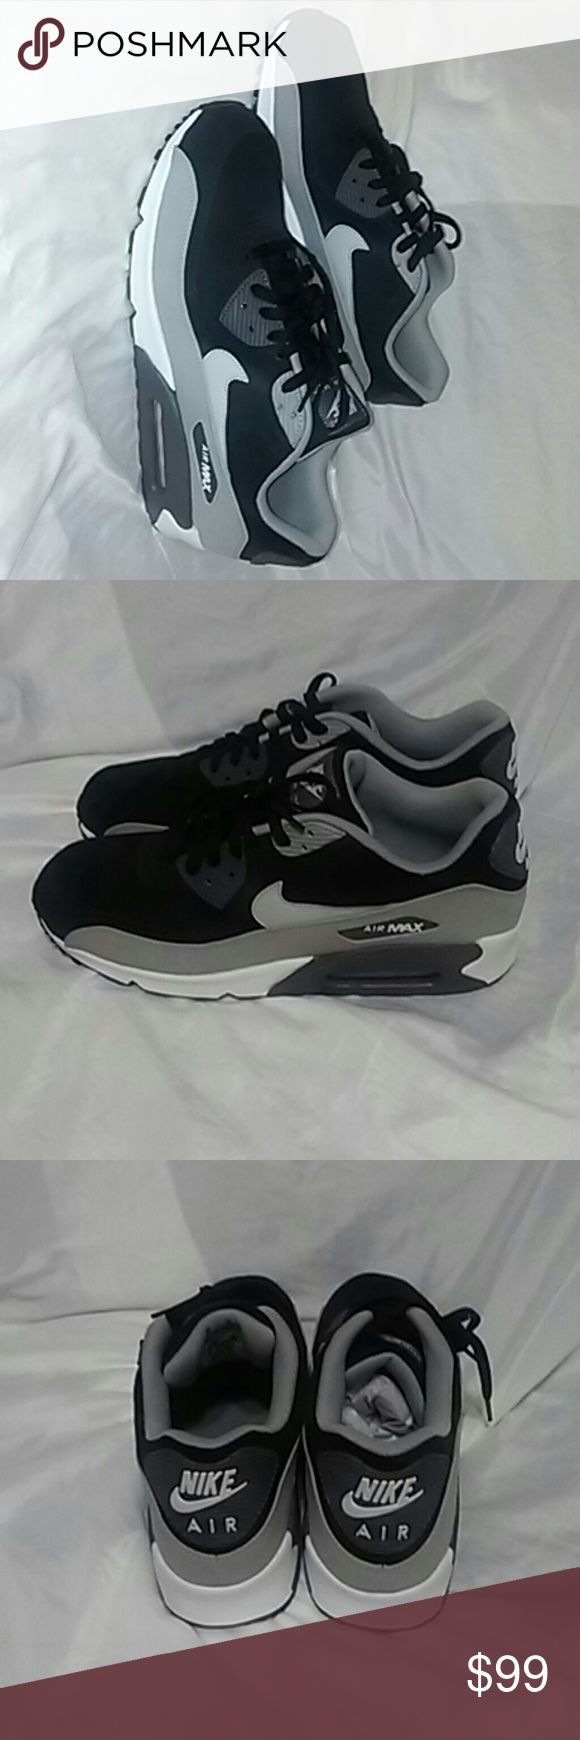 NIKE AIR MAX 90 LTR PREMIUM SIZE 13 NIKE AIR MAX 90 LTR PREMIUM SIZE 13 Nike Shoes Sneakers